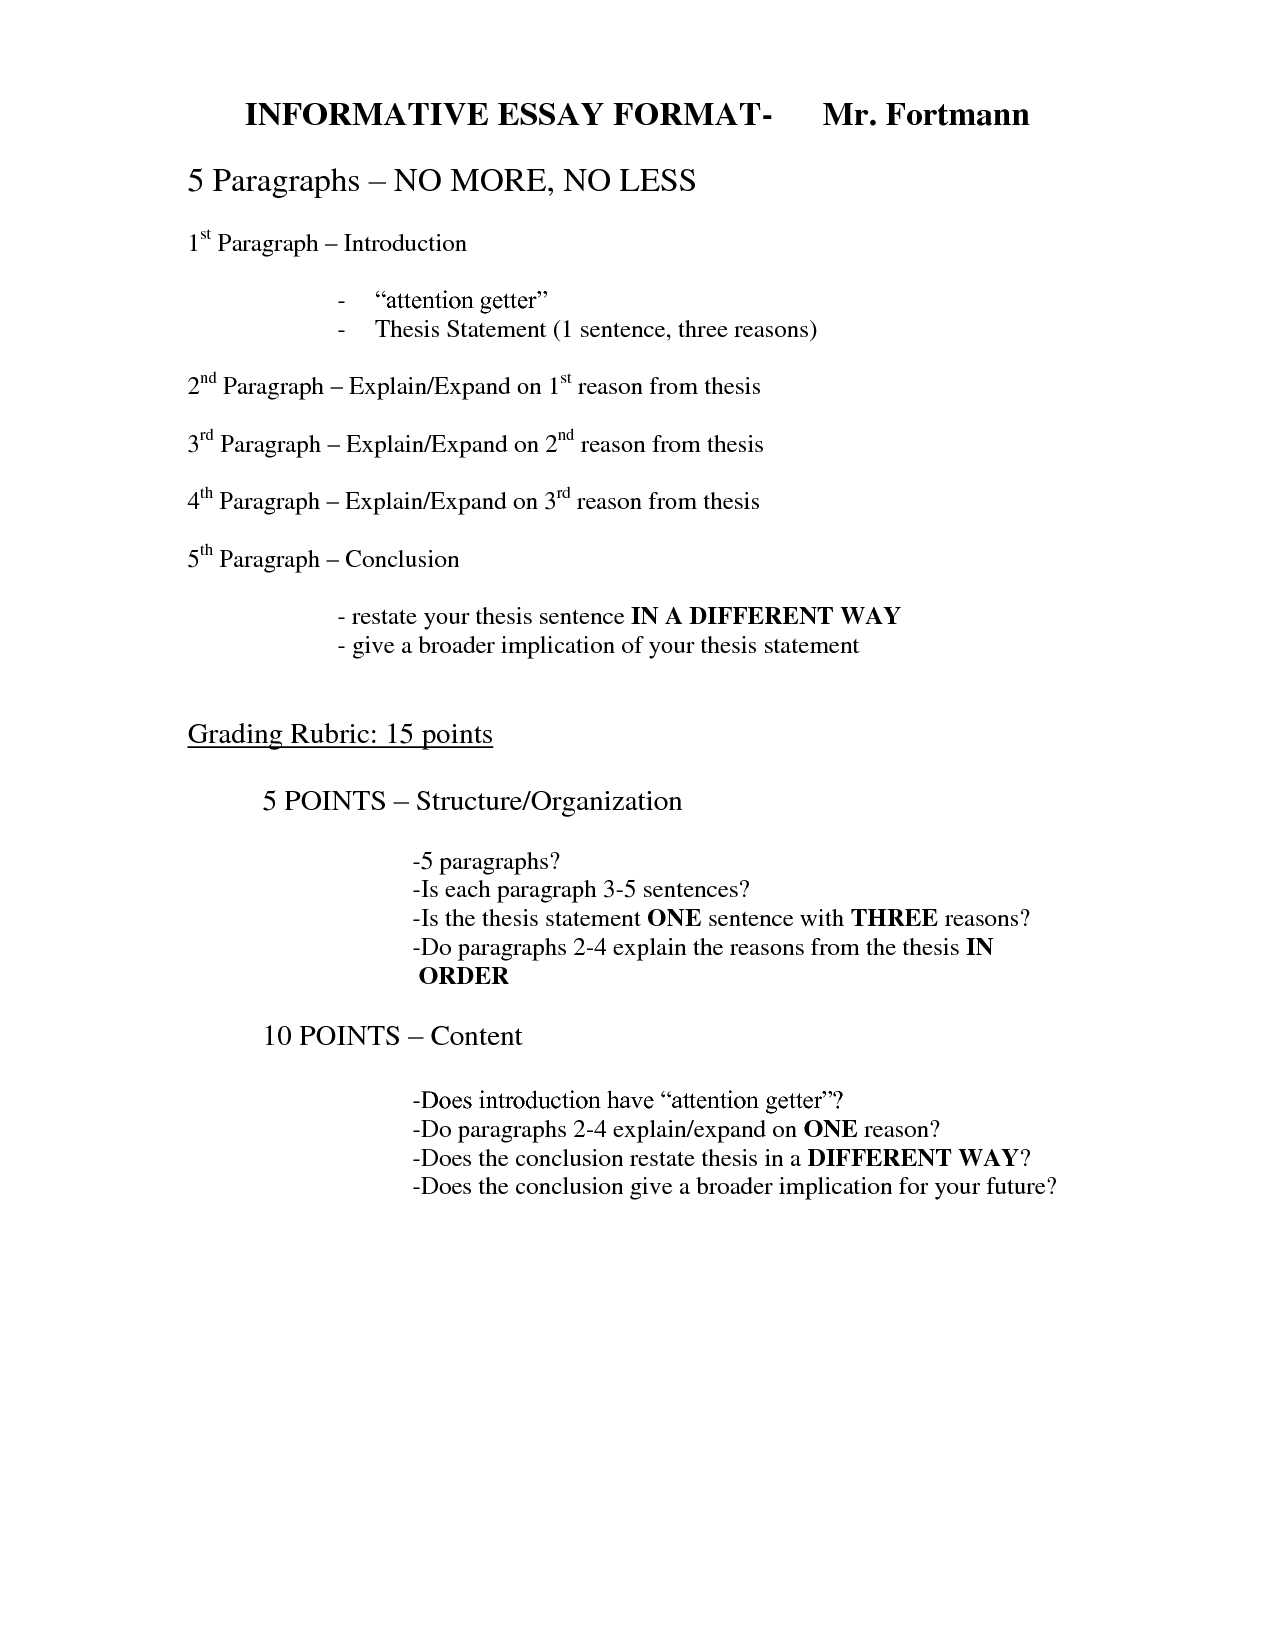 009 Outline Of An Essay Sensational Argumentative Sample Co Education Pdf Full